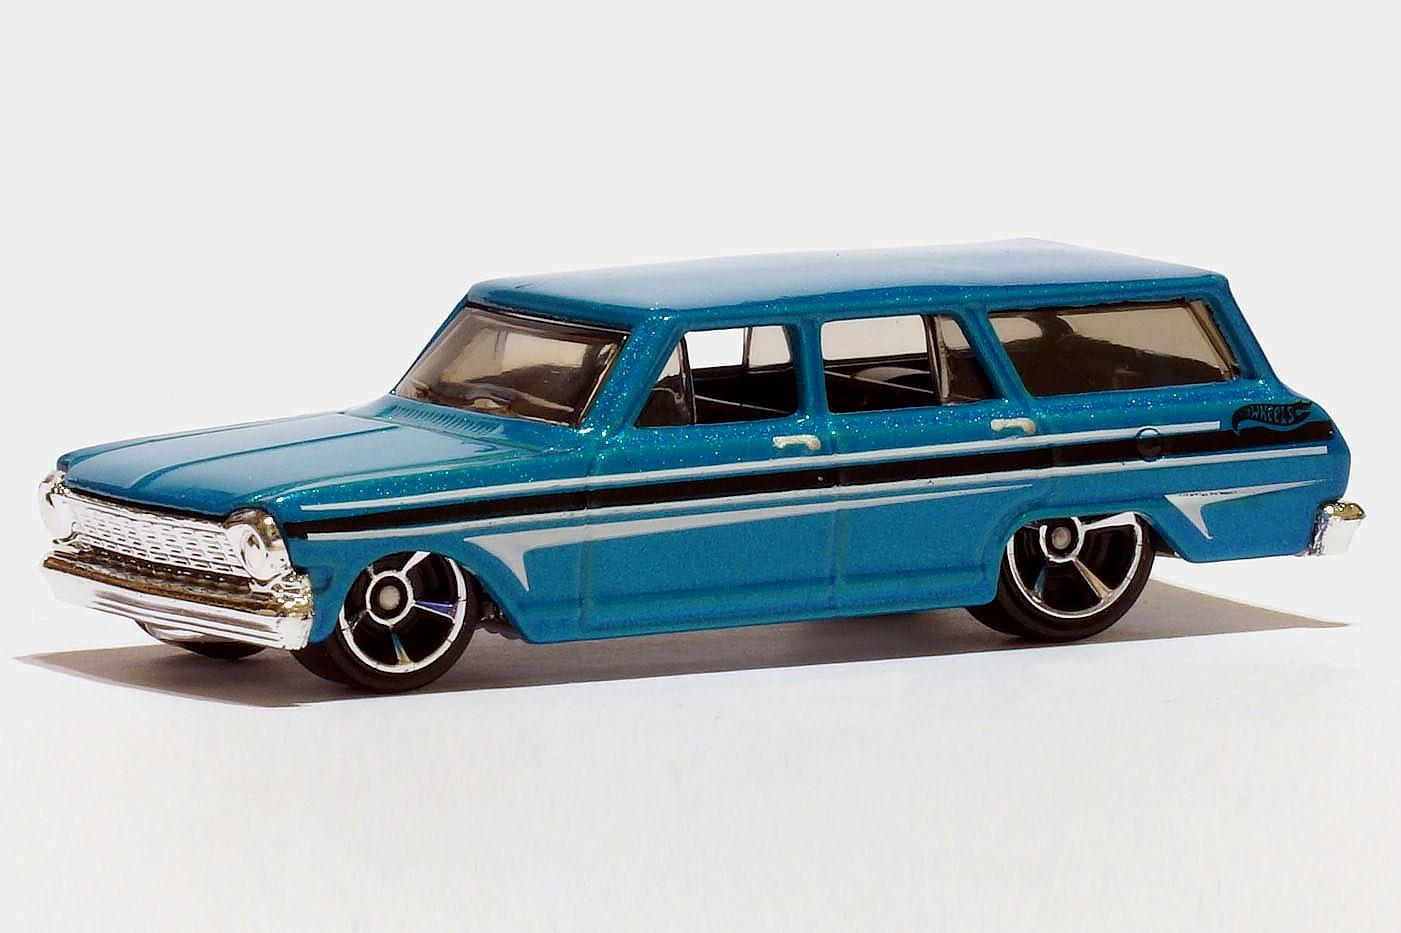 All Chevy 64 chevy nova : 64 Chevy Nova Station Wagon | Hot Wheels Wiki | FANDOM powered by ...